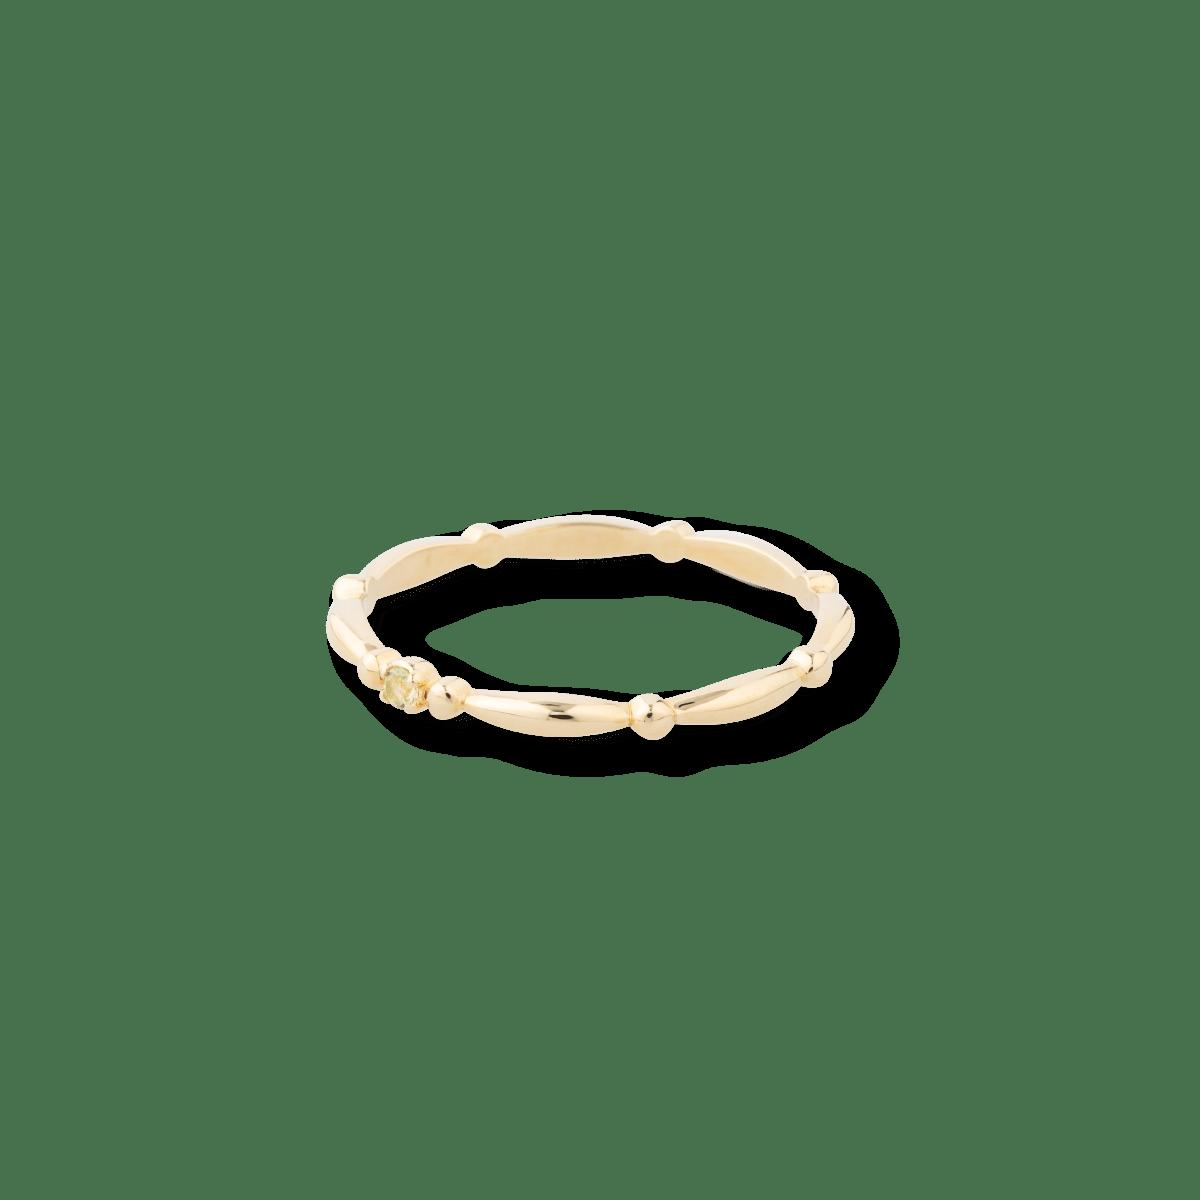 Royal Birthstone Ring